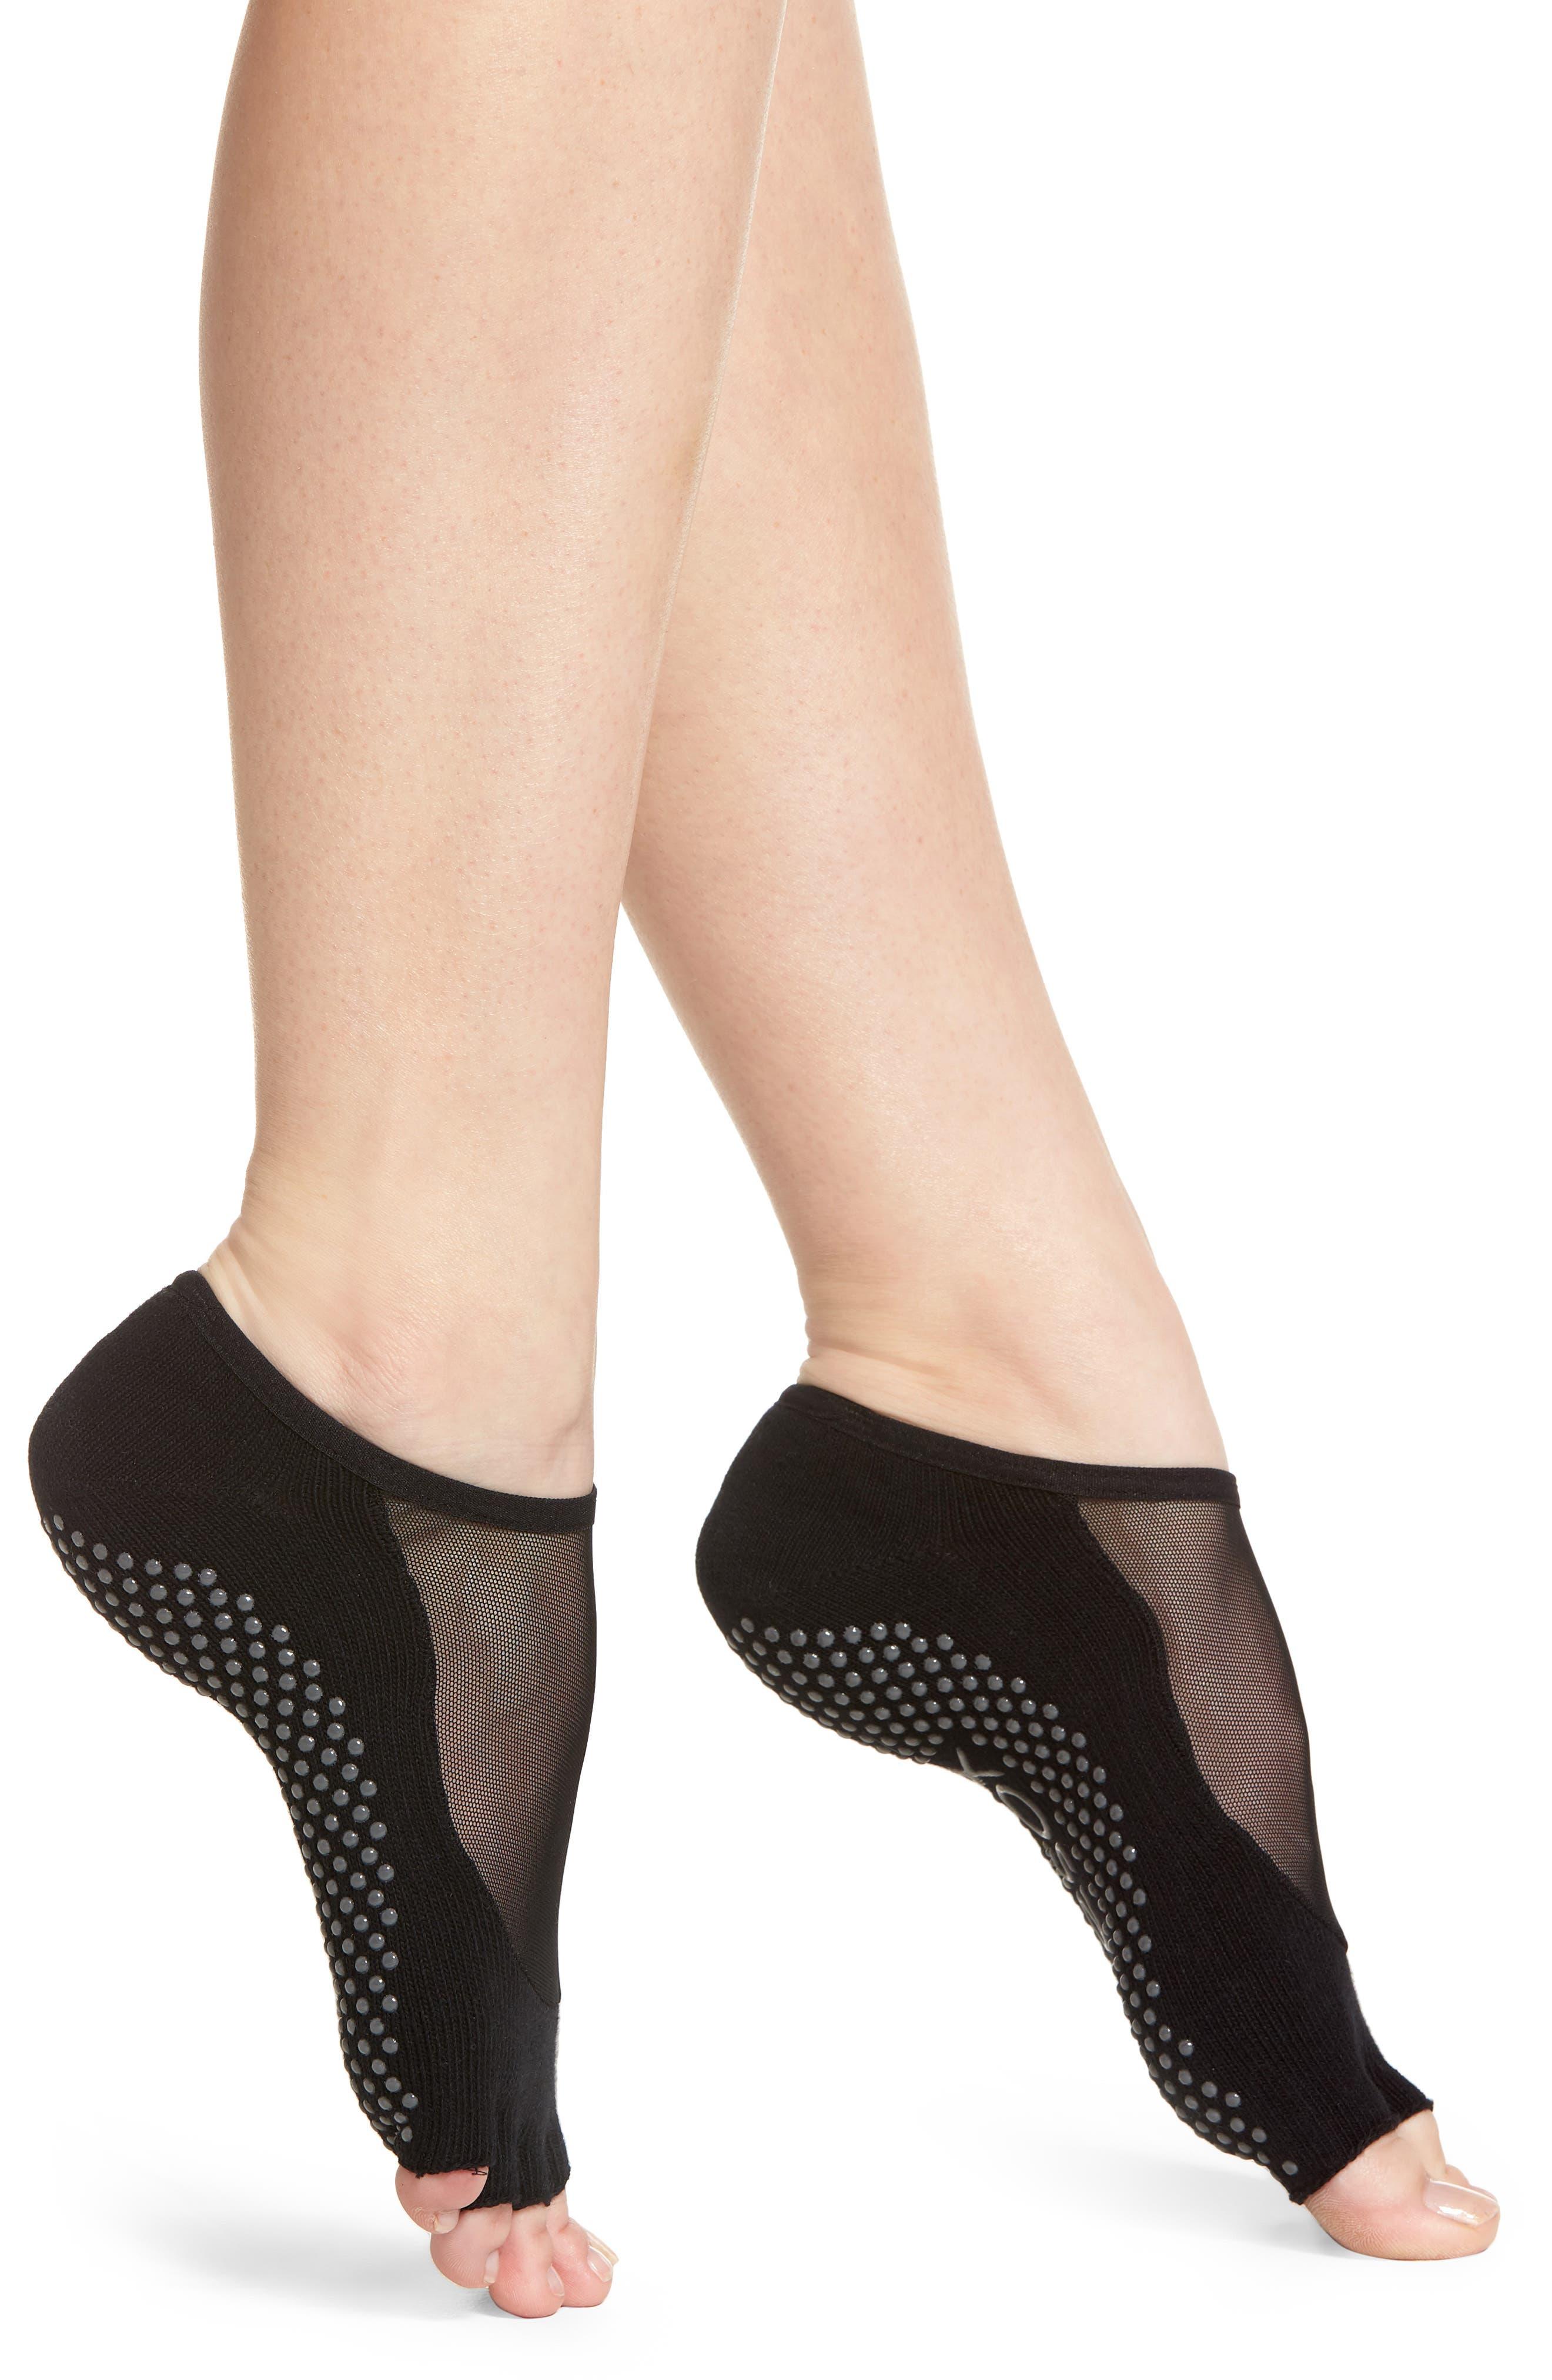 Luna Half Toe Gripper Socks,                             Main thumbnail 1, color,                             BLACK